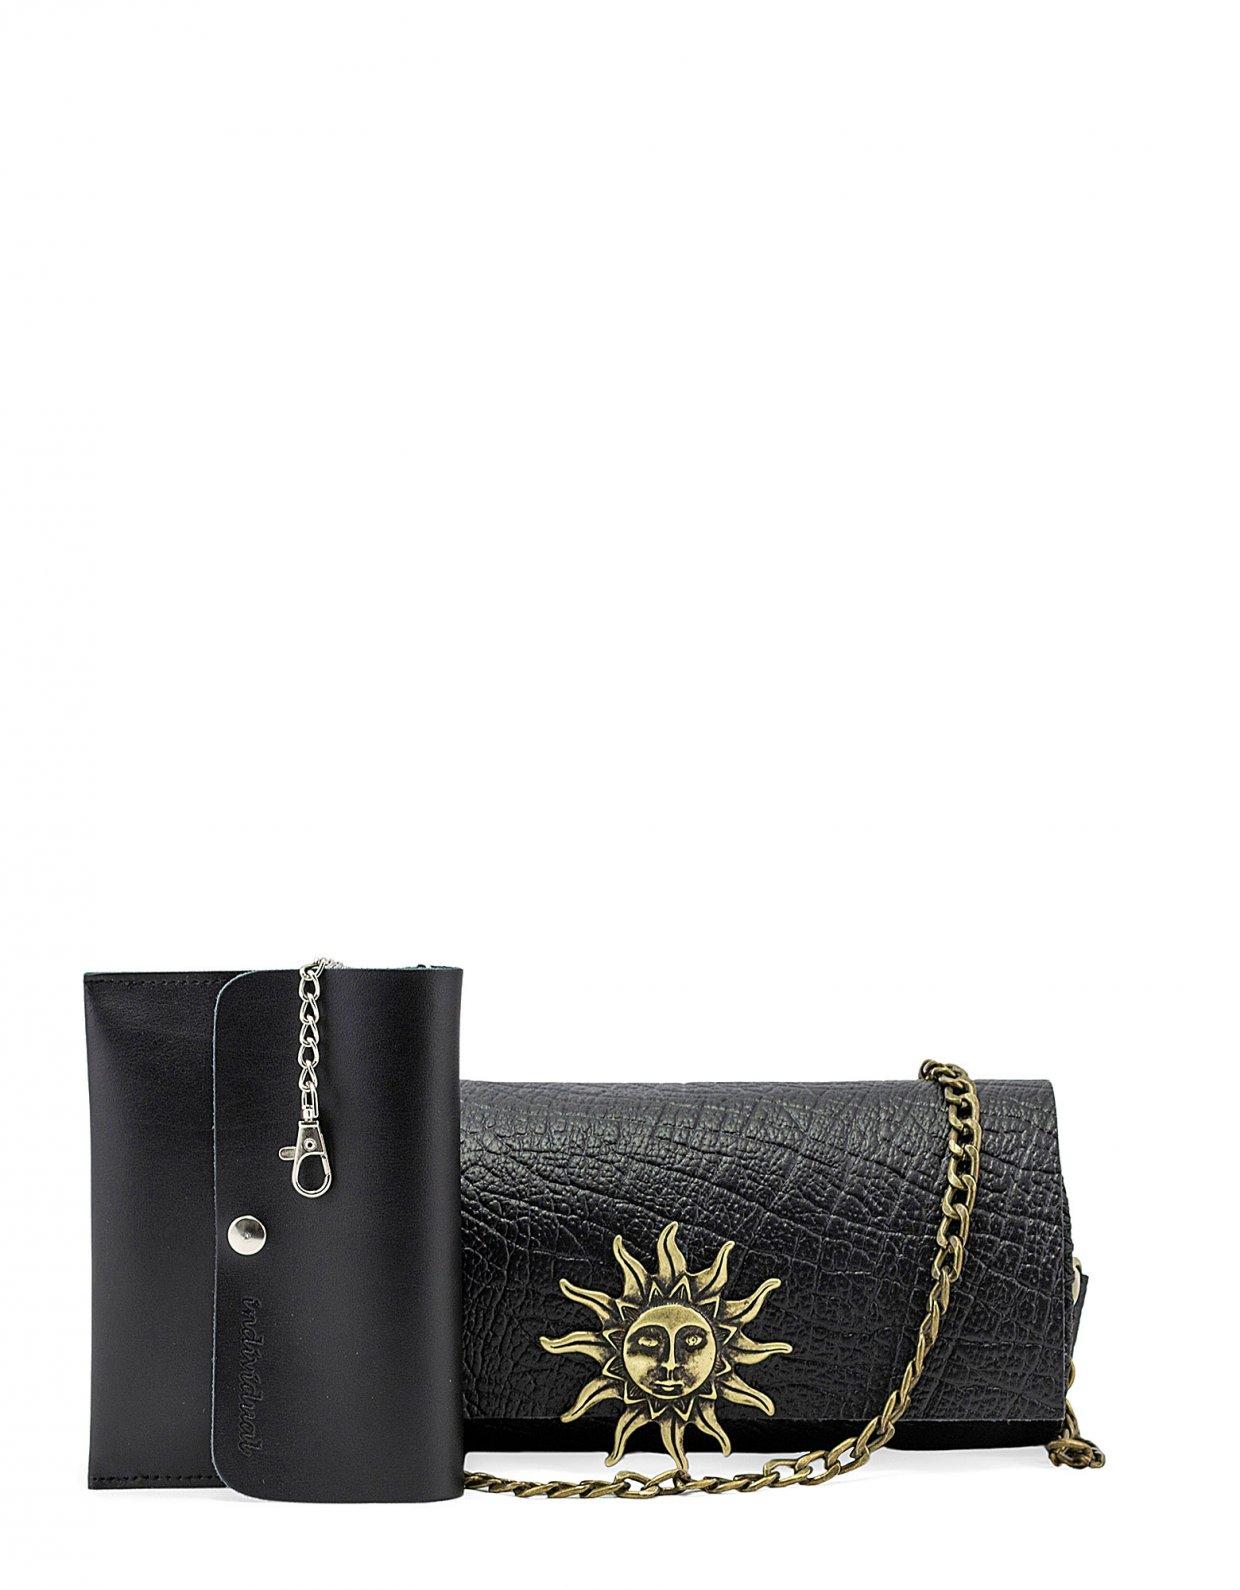 Individual Art Leather Believe barrel bag black